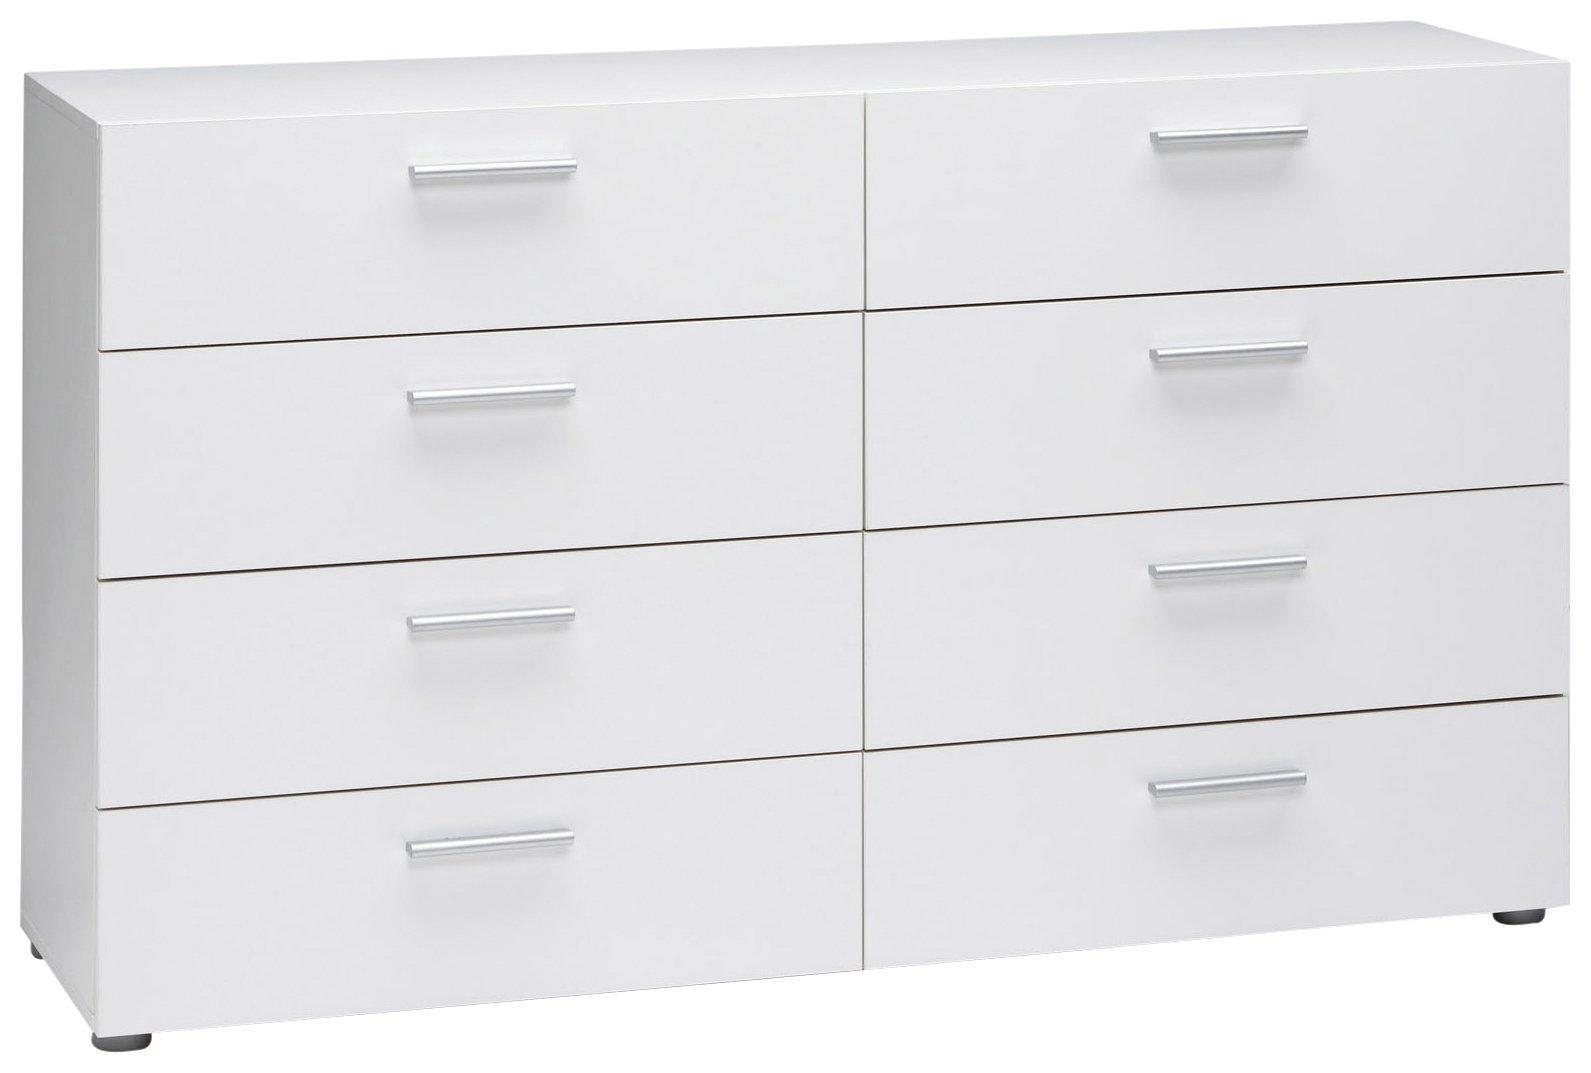 Tvilum Austin 8-Drawer Dresser, White by Tvilum